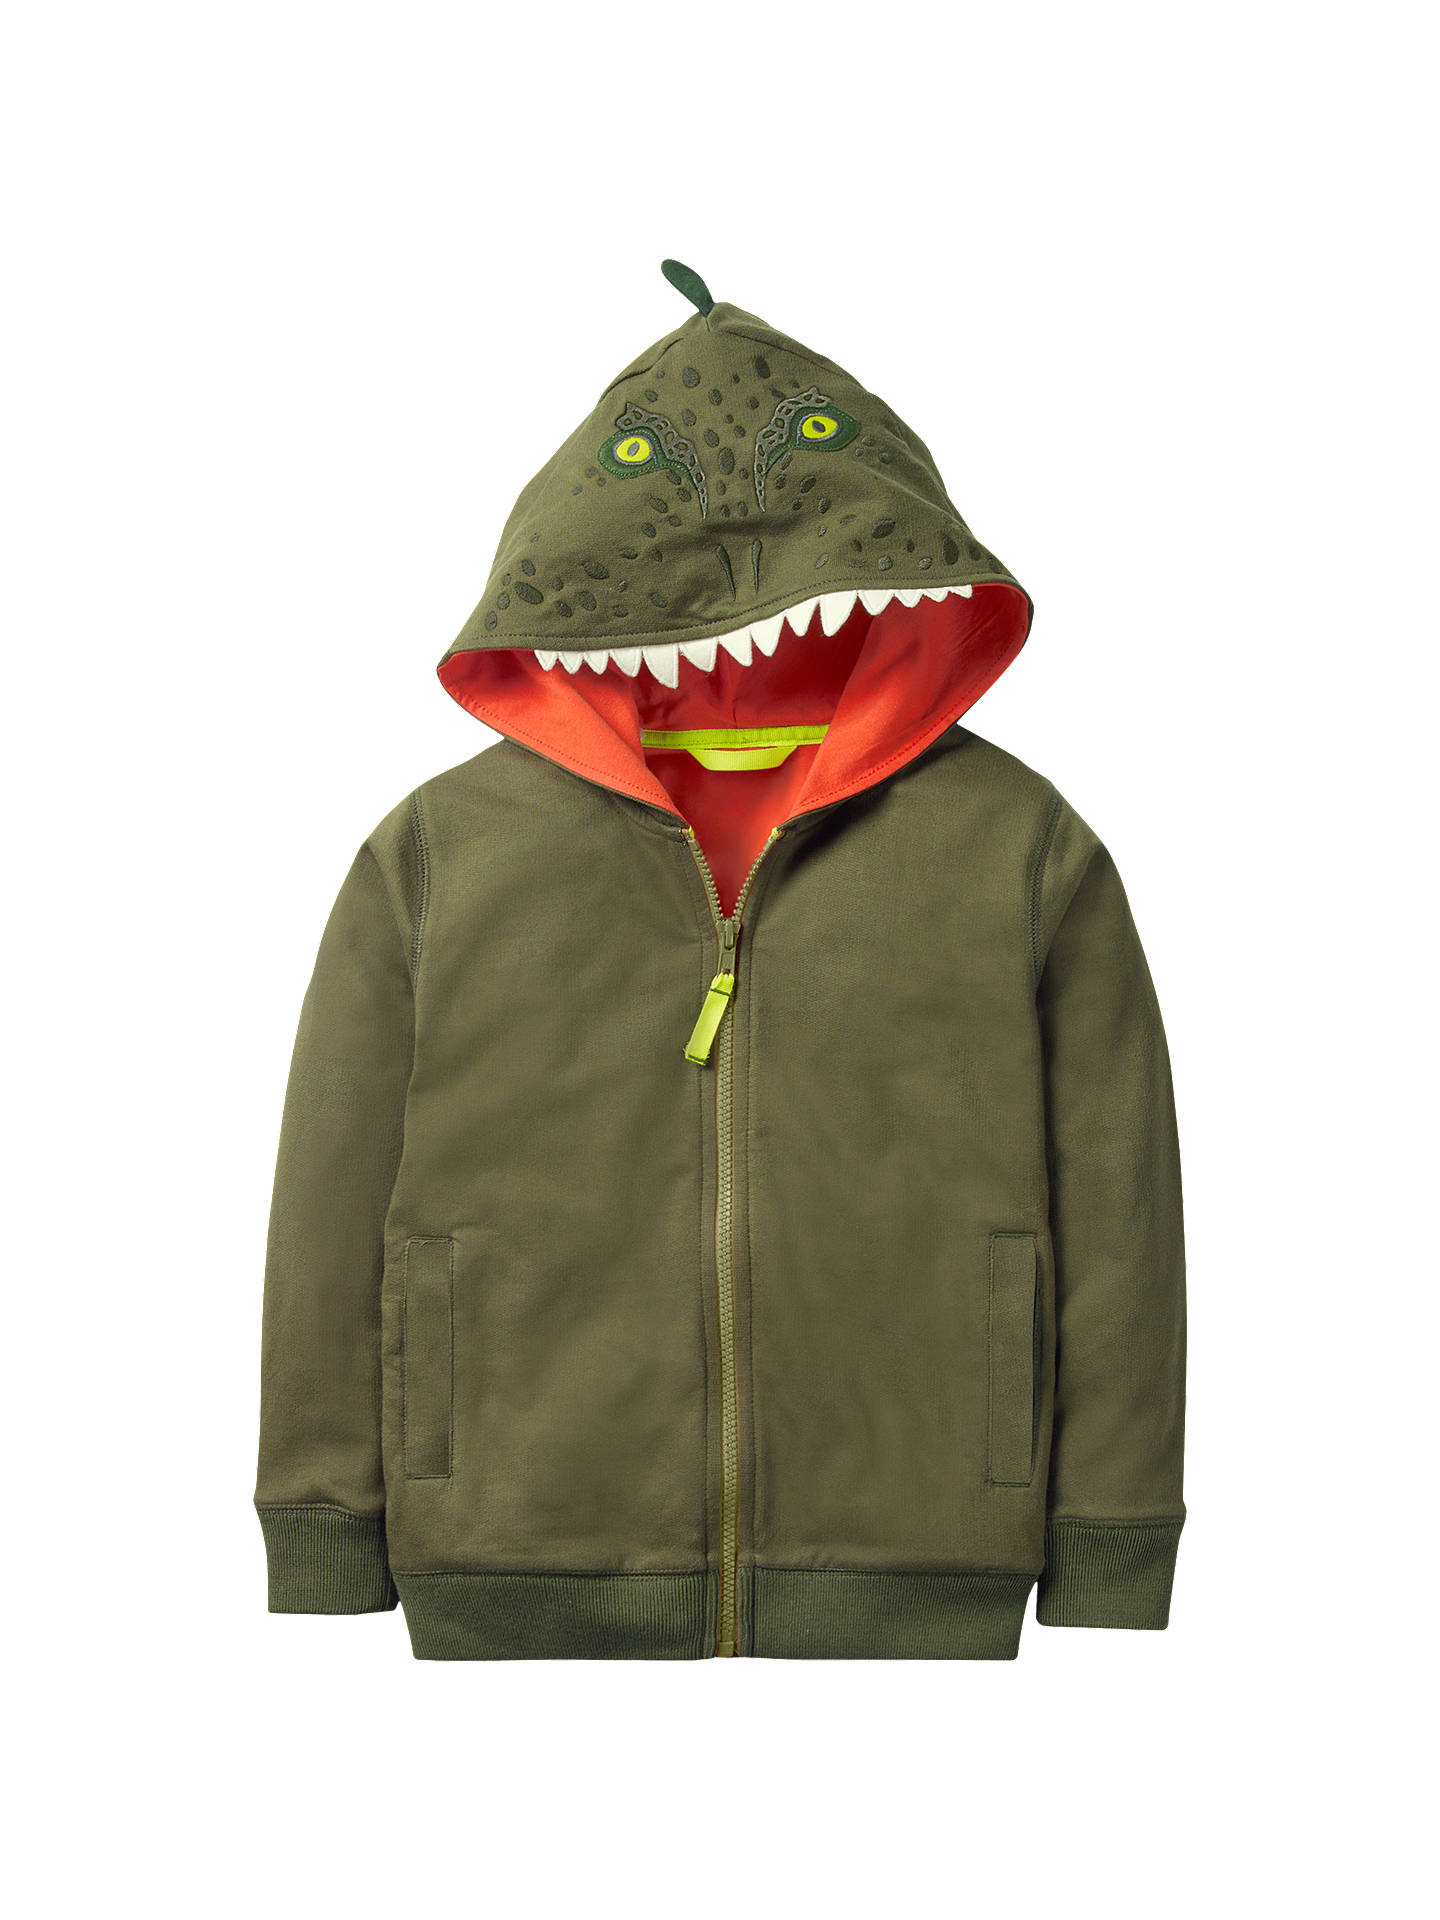 a378fd8fc Buy Mini Boden Boys' Novelty Dinosaur Zip Through Hoodie, Green, 2-3 ...